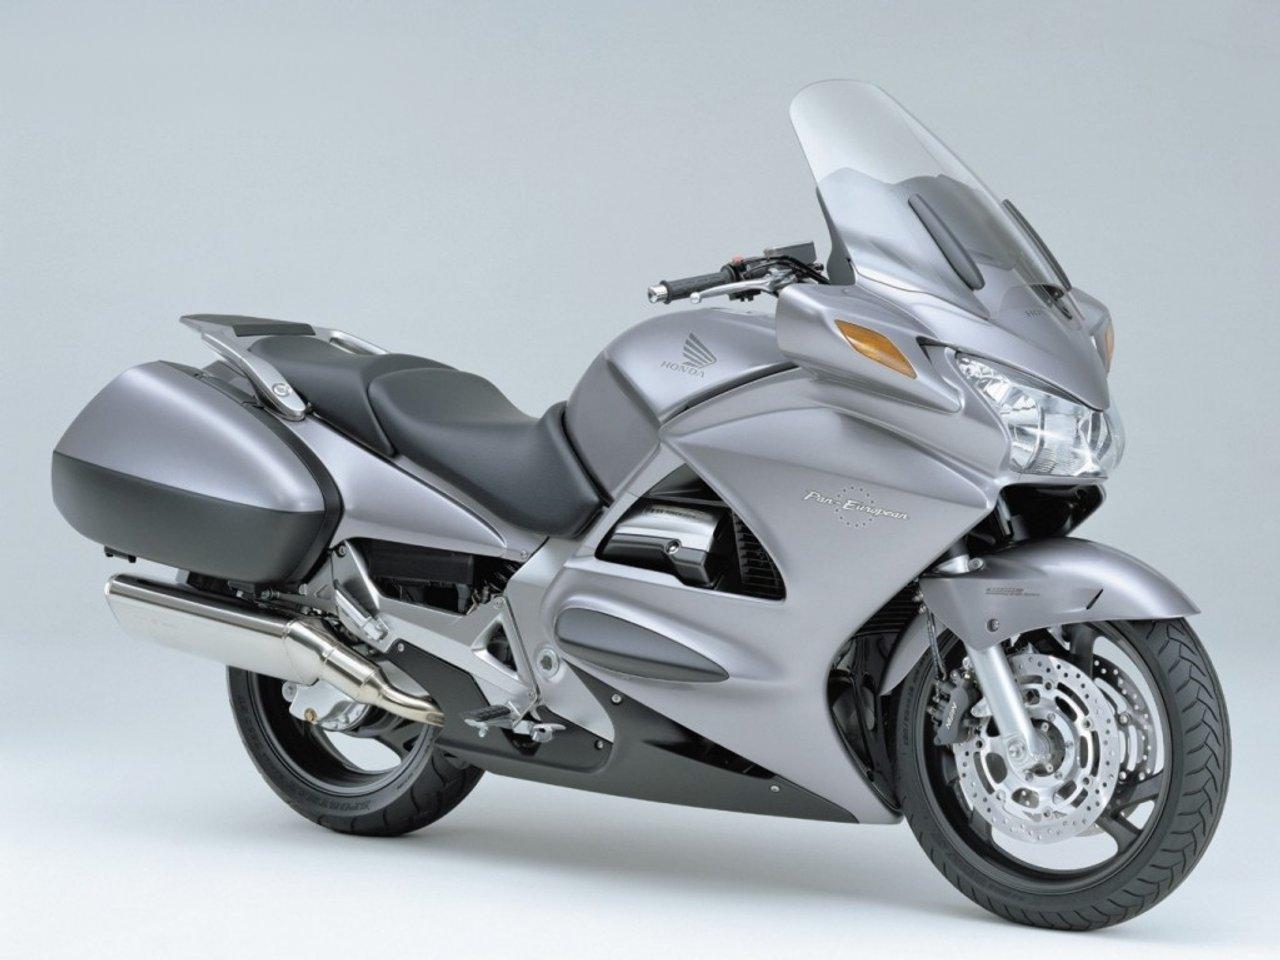 Modern Motorcycle Showdown The Contenders Salzmoto